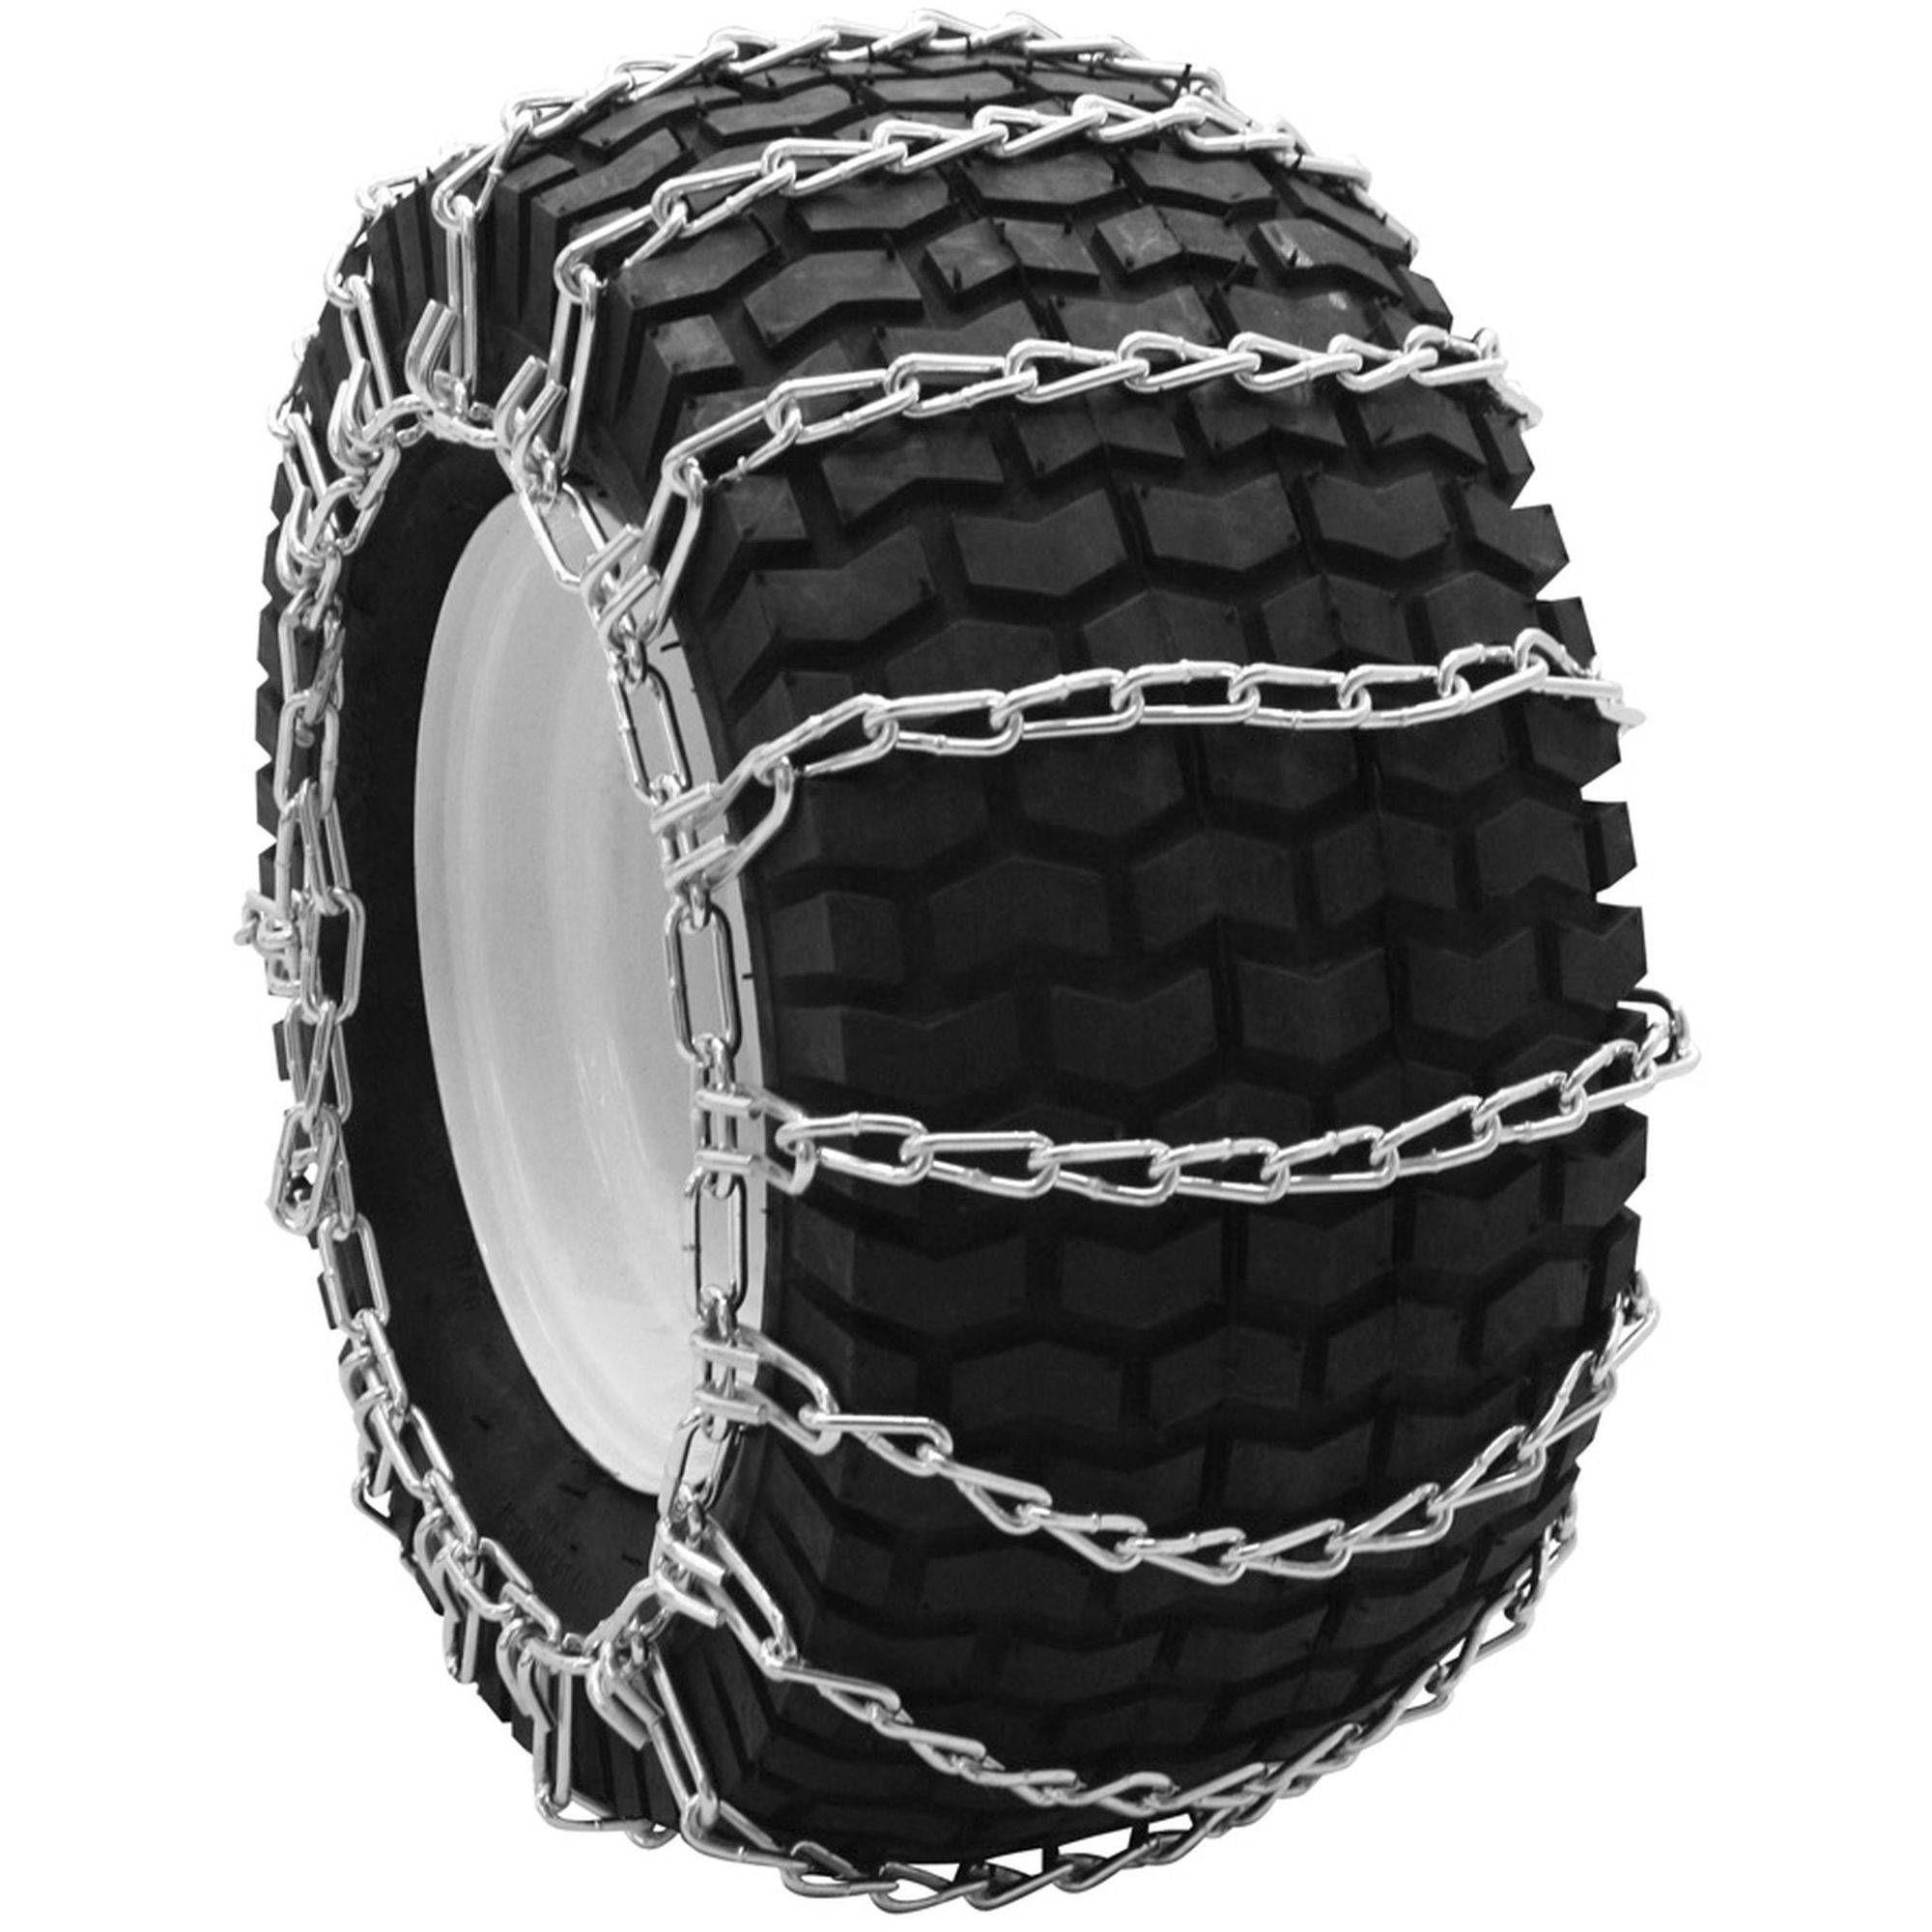 Security Chain Company 1062255 Max Trac Snow Blower Garden Tractor Tire Chain SCC